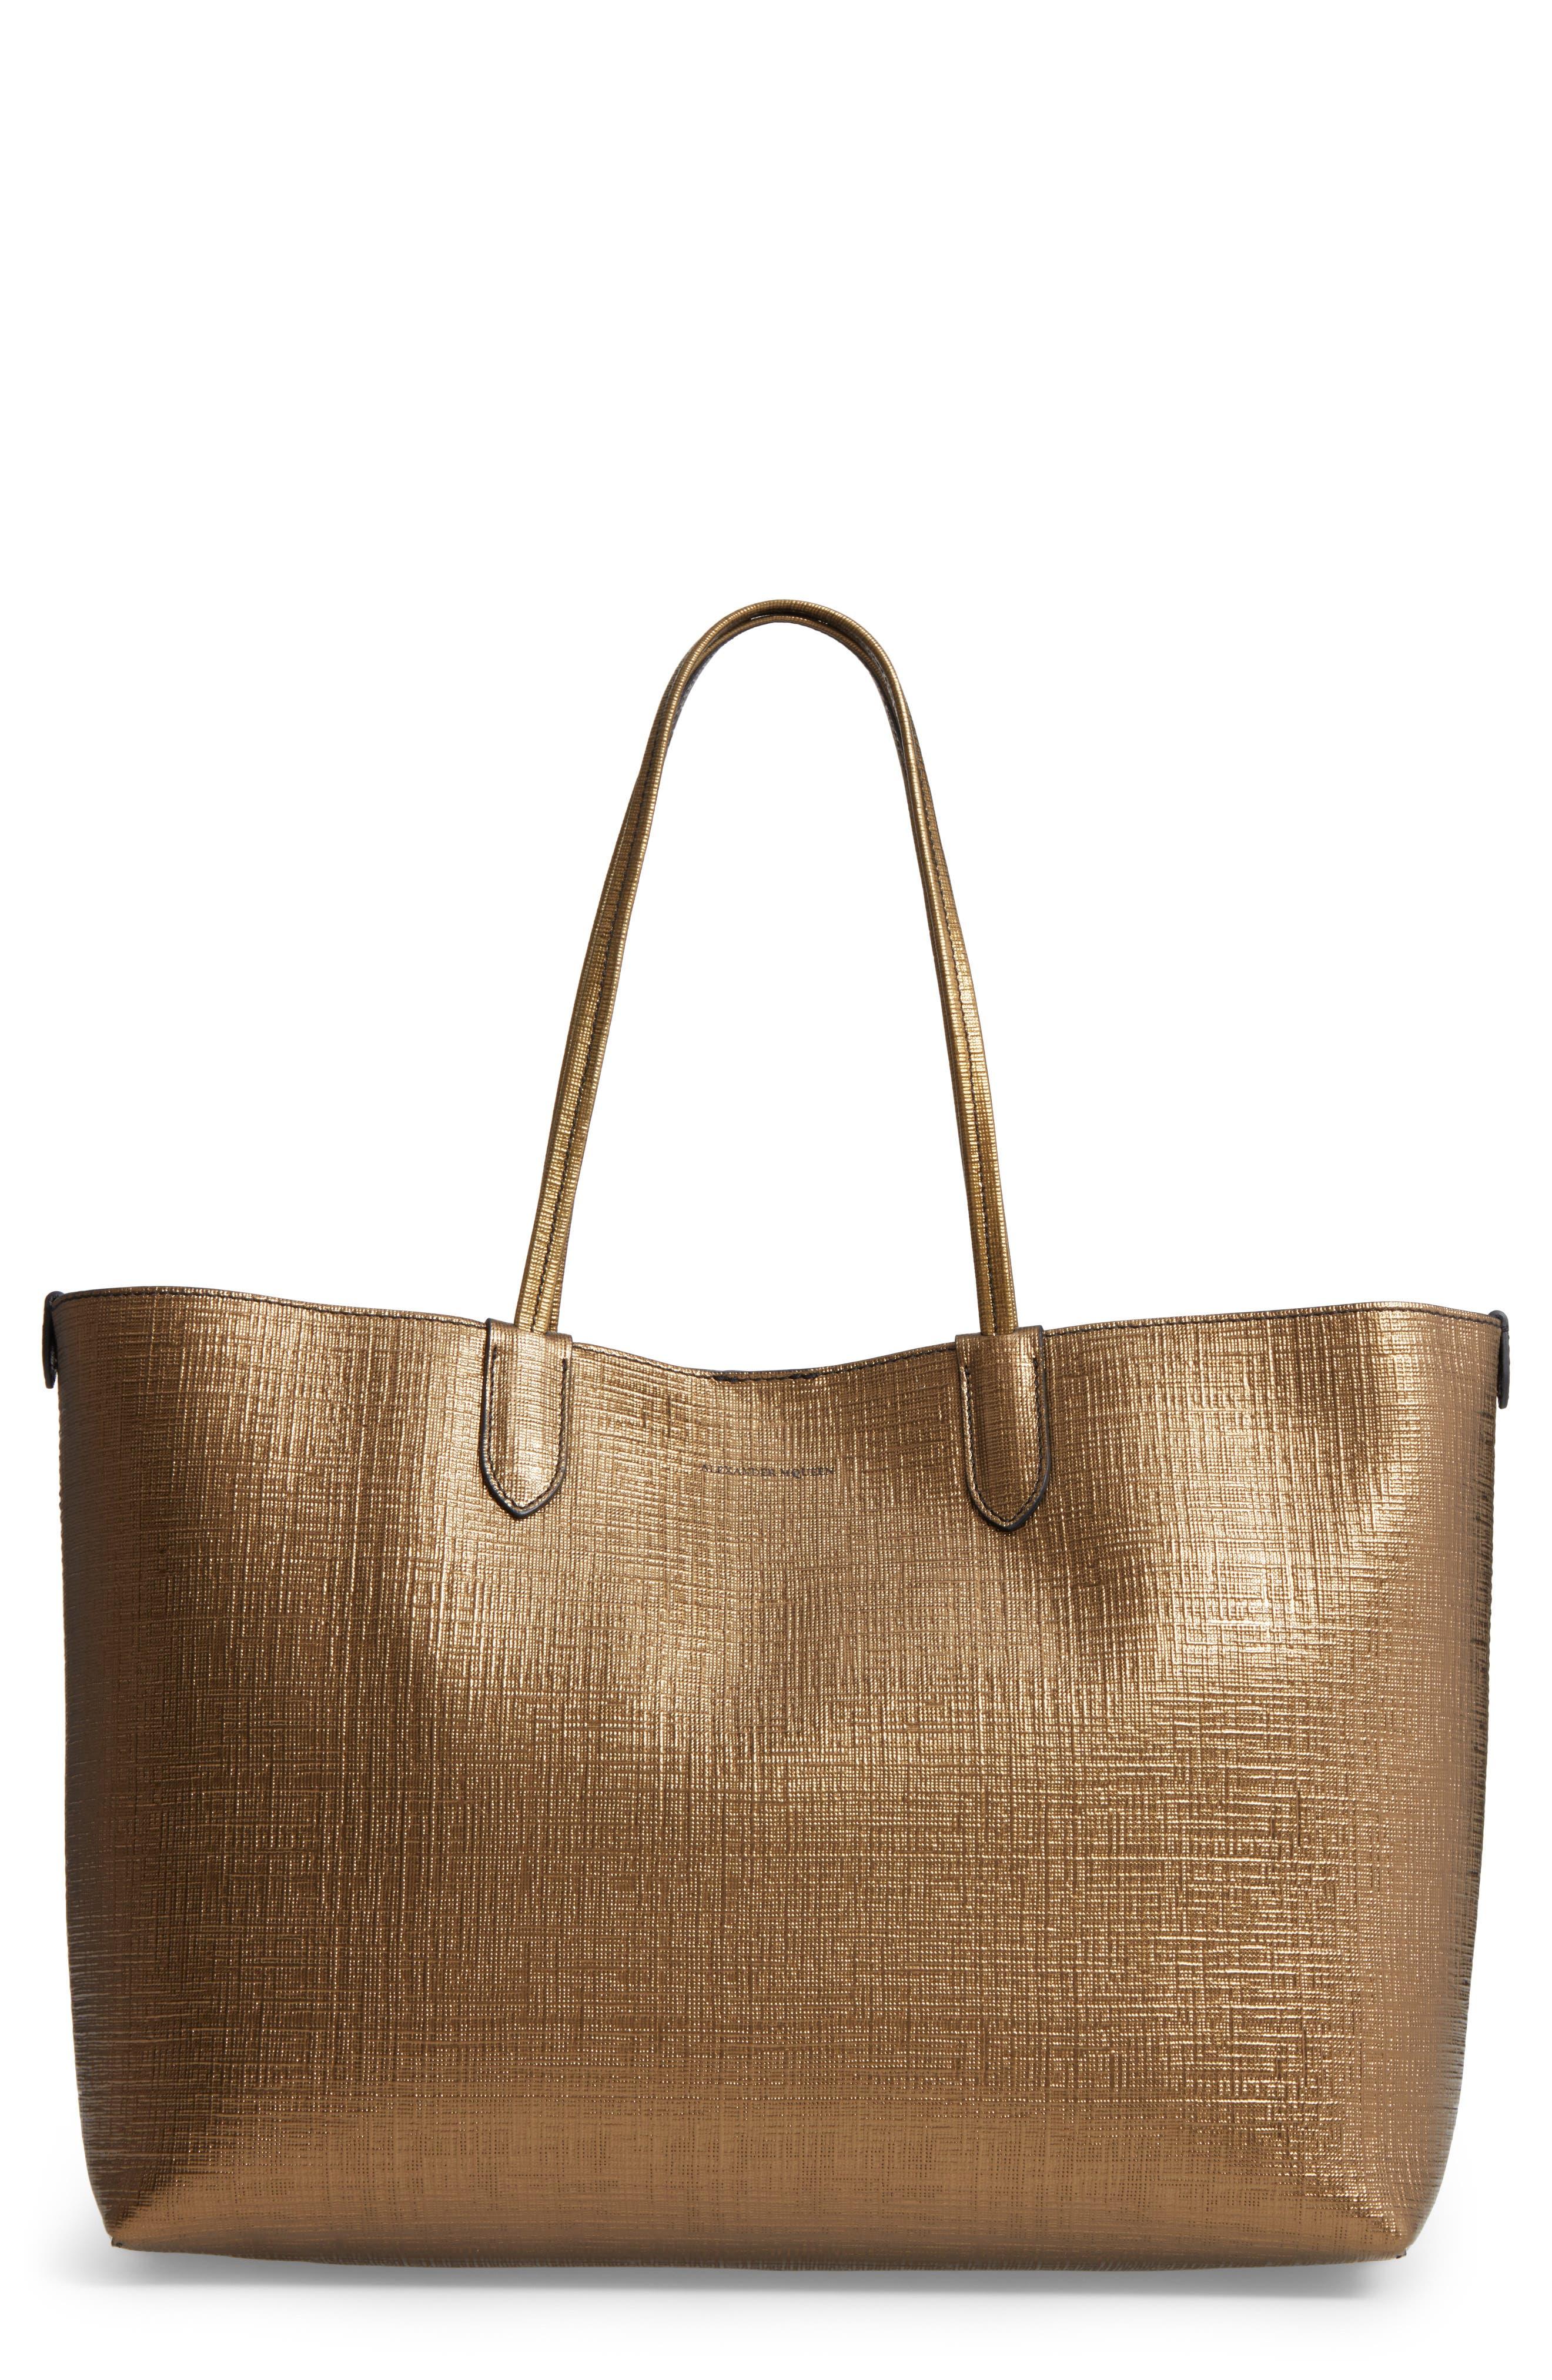 Alexander McQueen Medium Metallic Leather Shopper